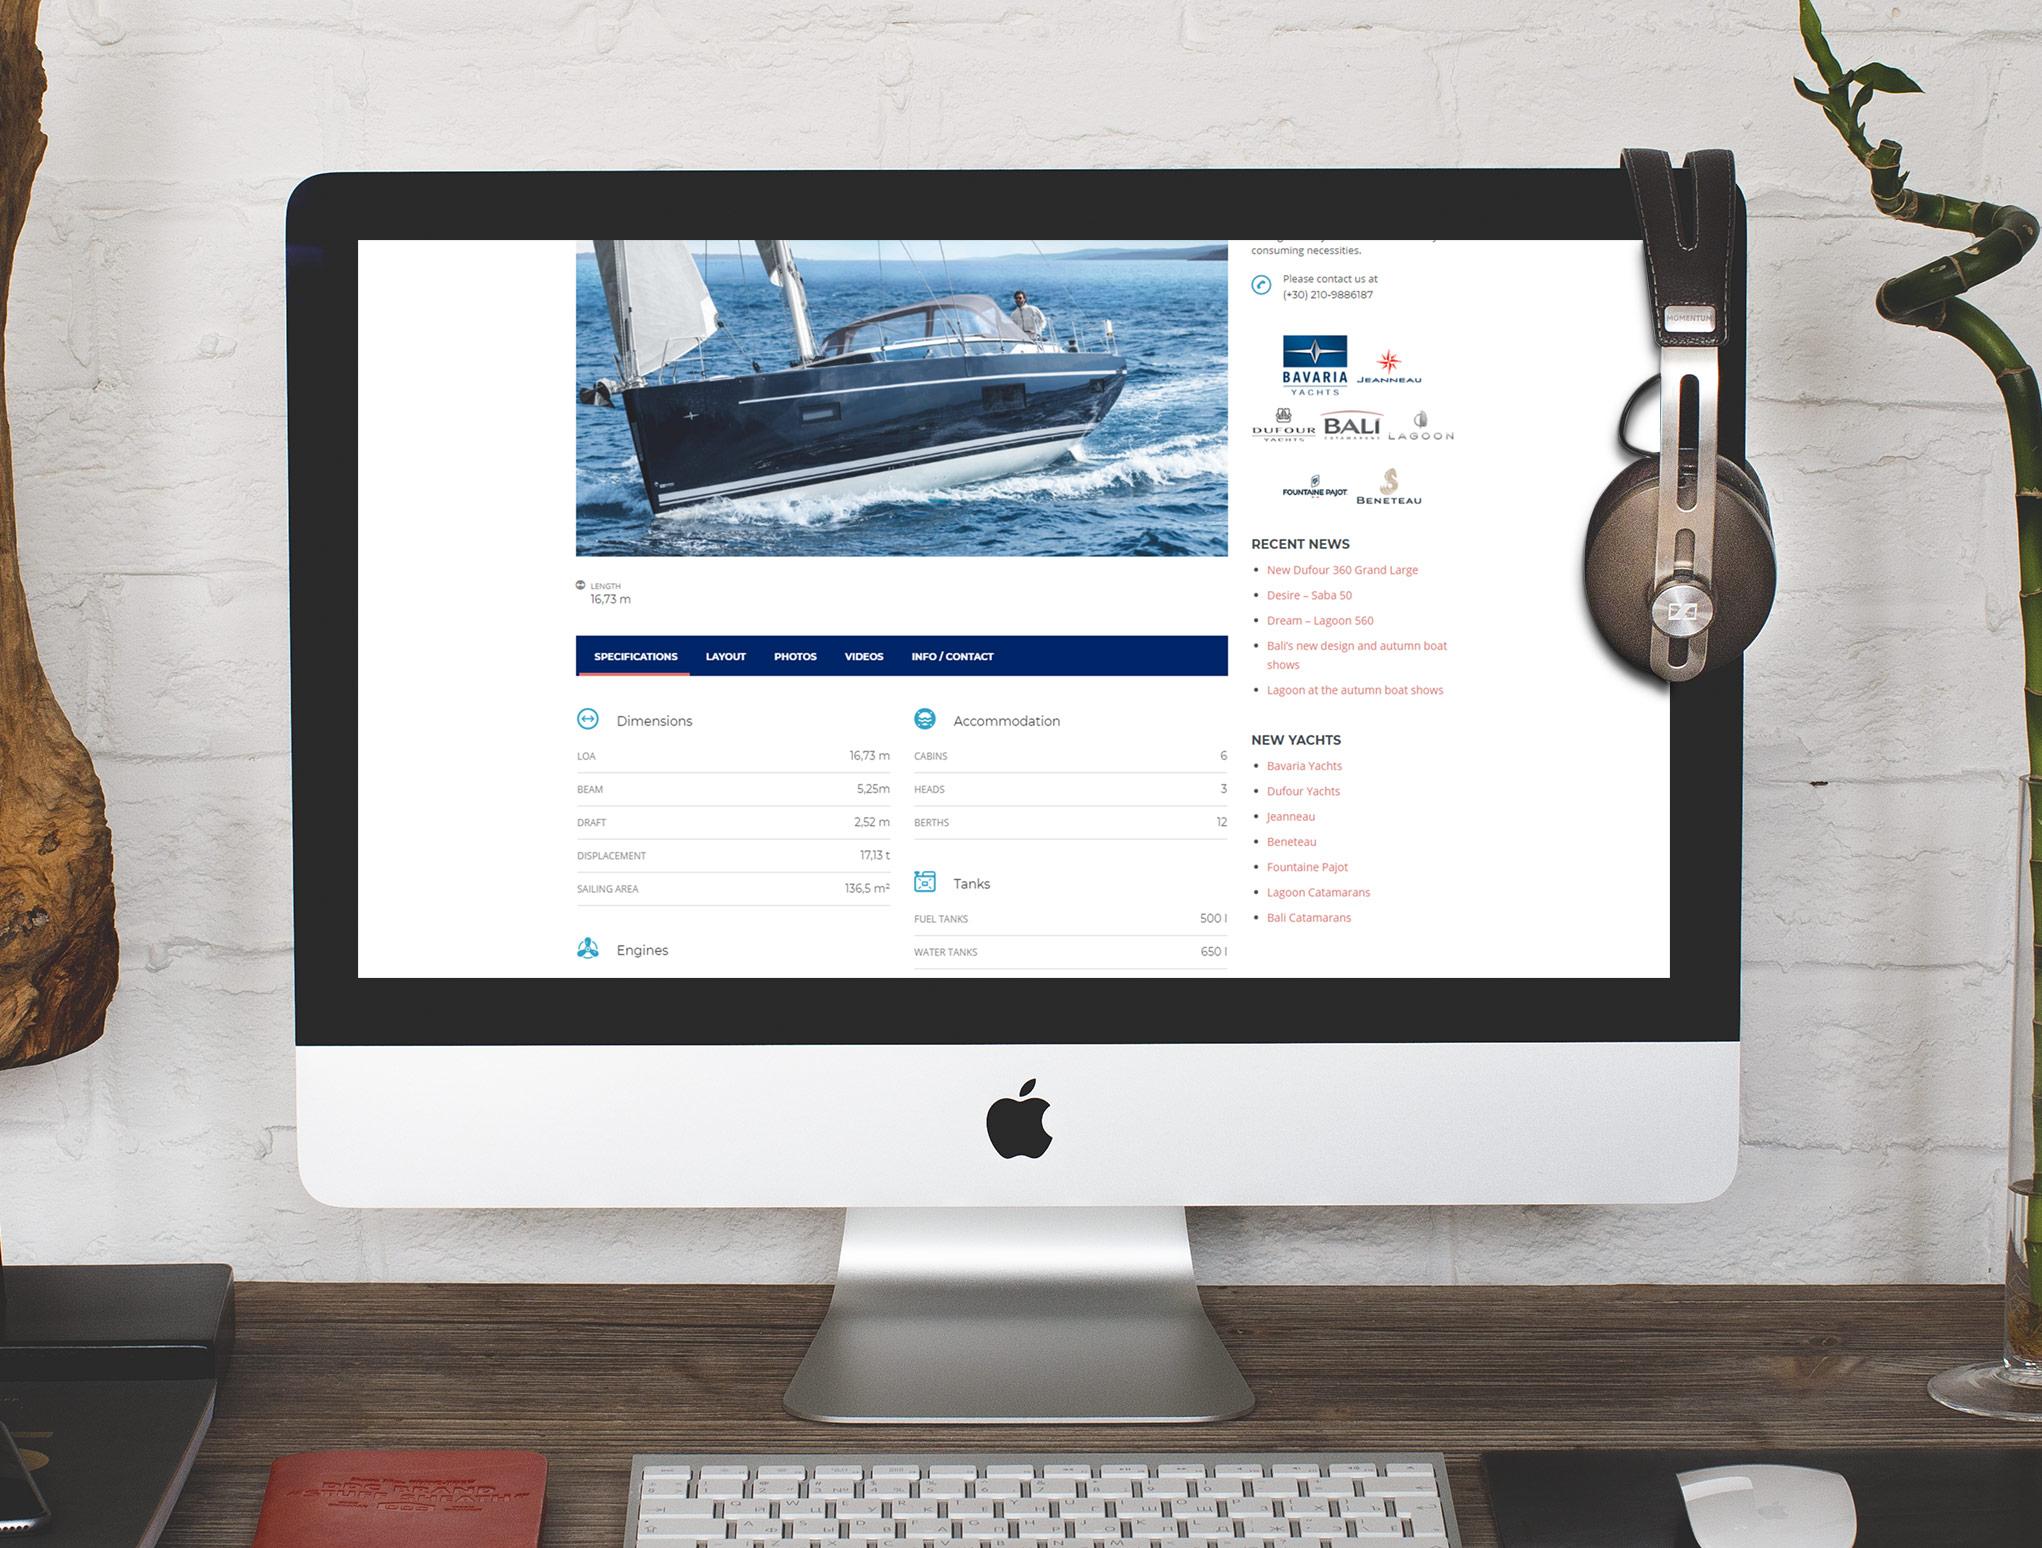 kiriacoulis_sales_boat_specs